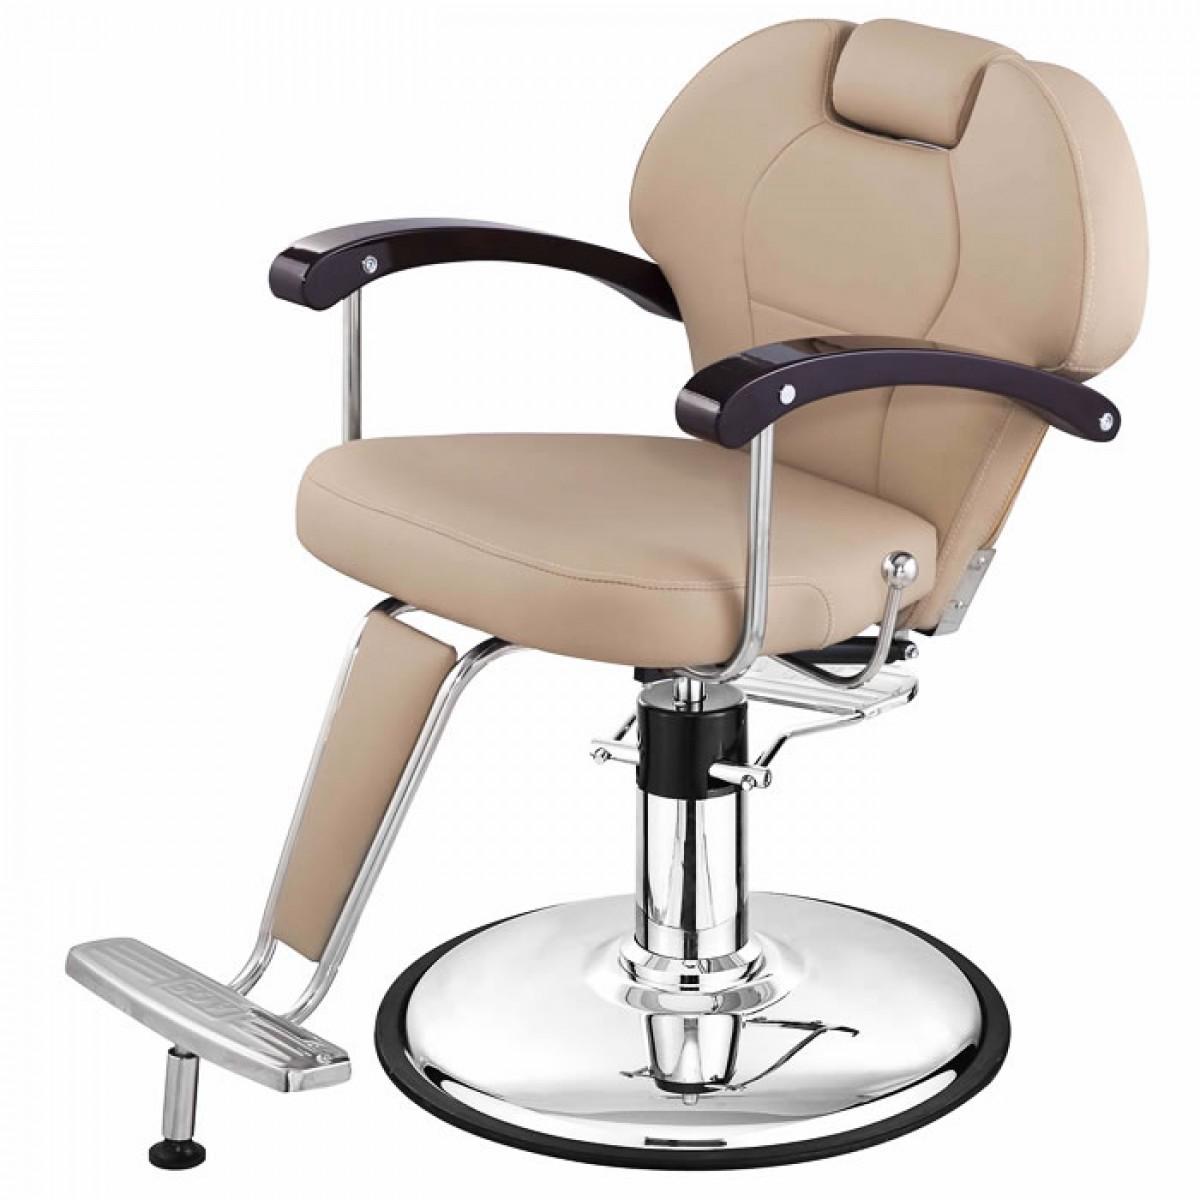 """KATHERINE"" Make-Up Chair in Khaki"